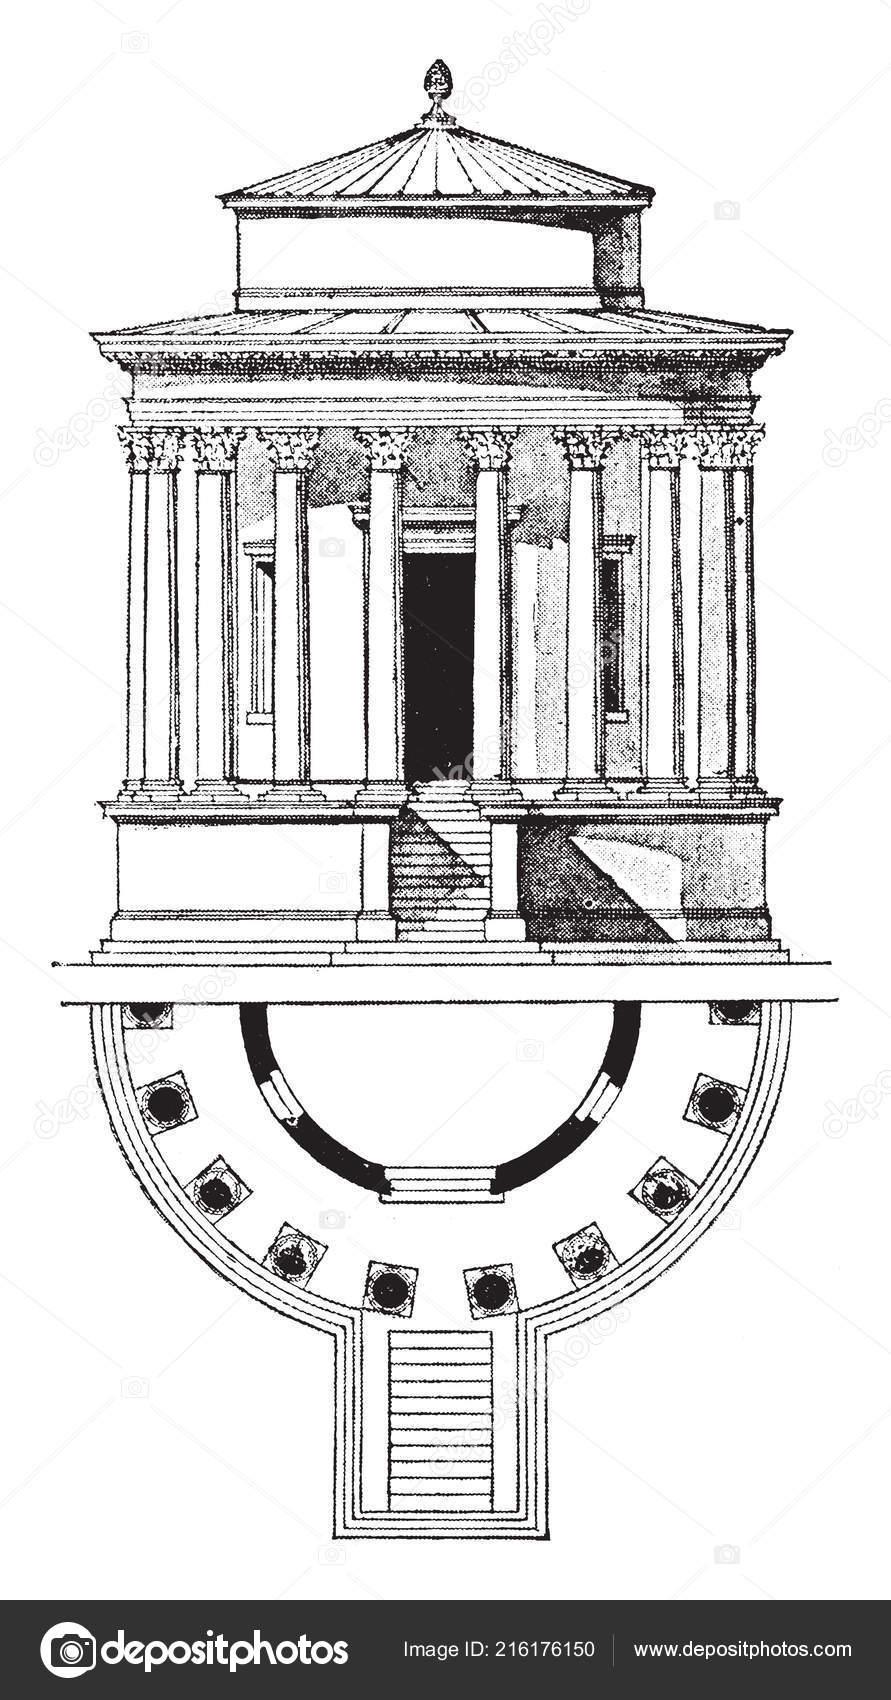 Siglo Tivoli Renacimiento Templo Bce Desde Primer Vesta Admirado JlKT1cF